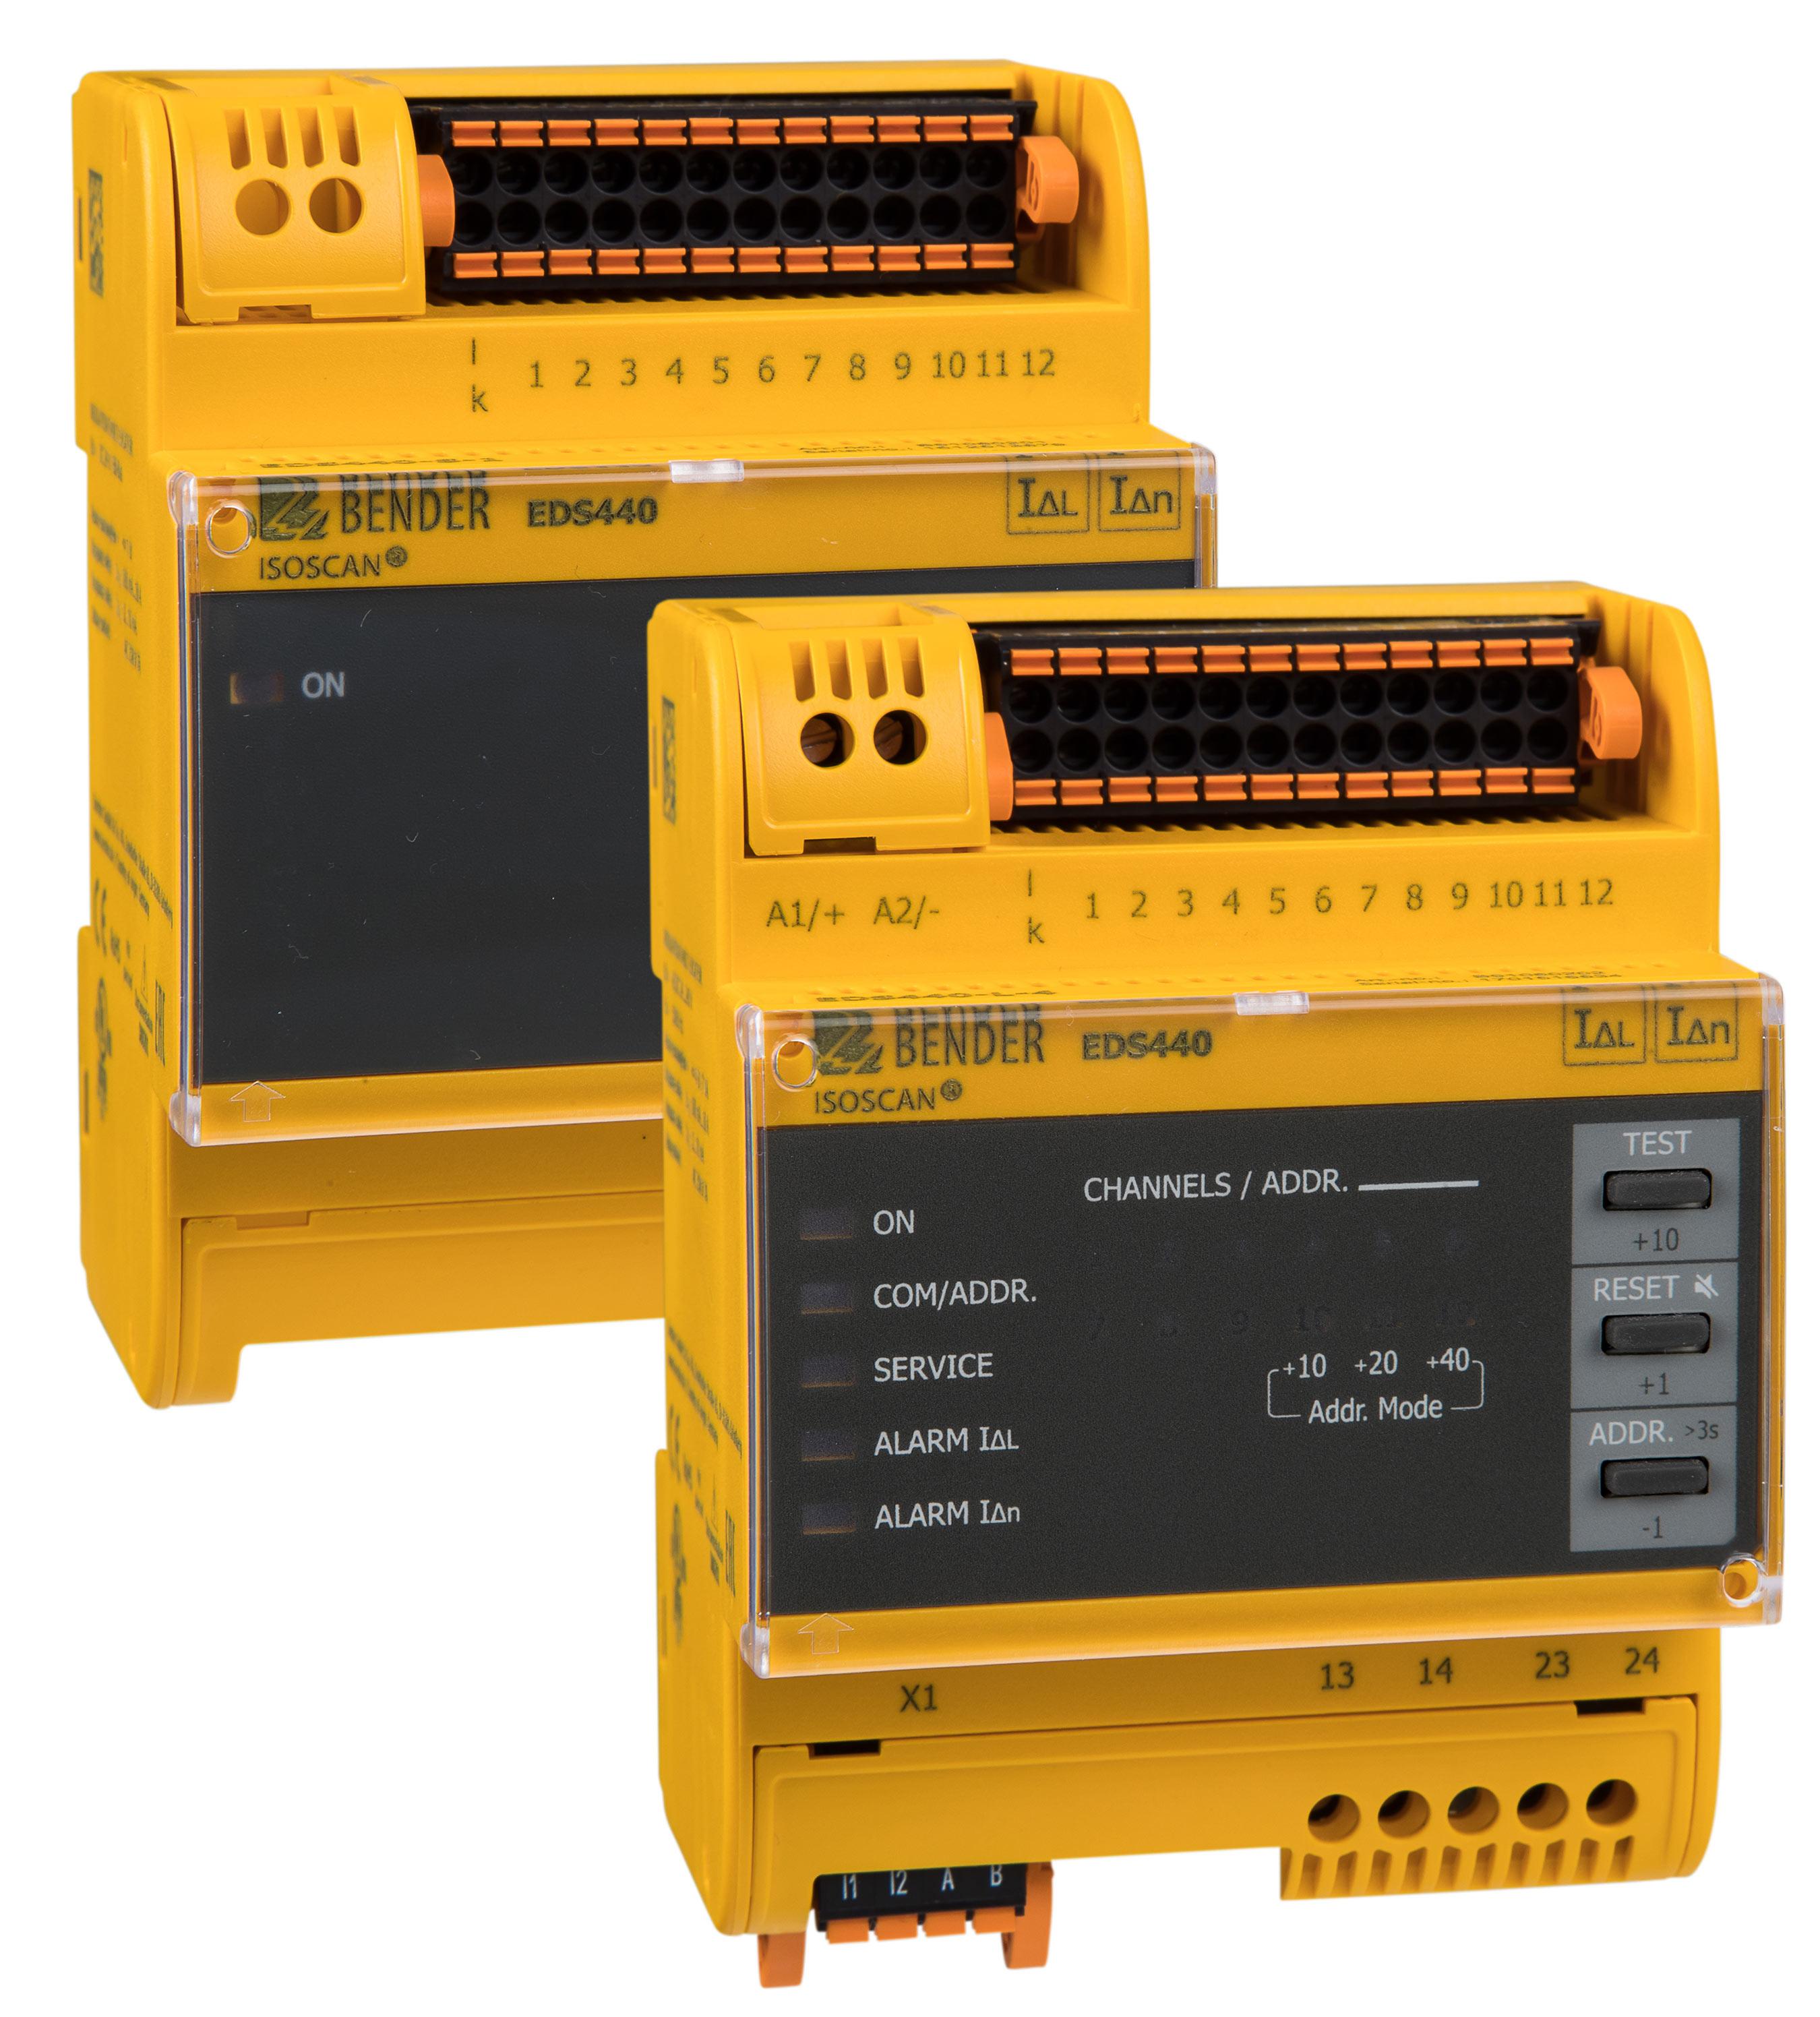 ISOSCAN® EDS440 Series